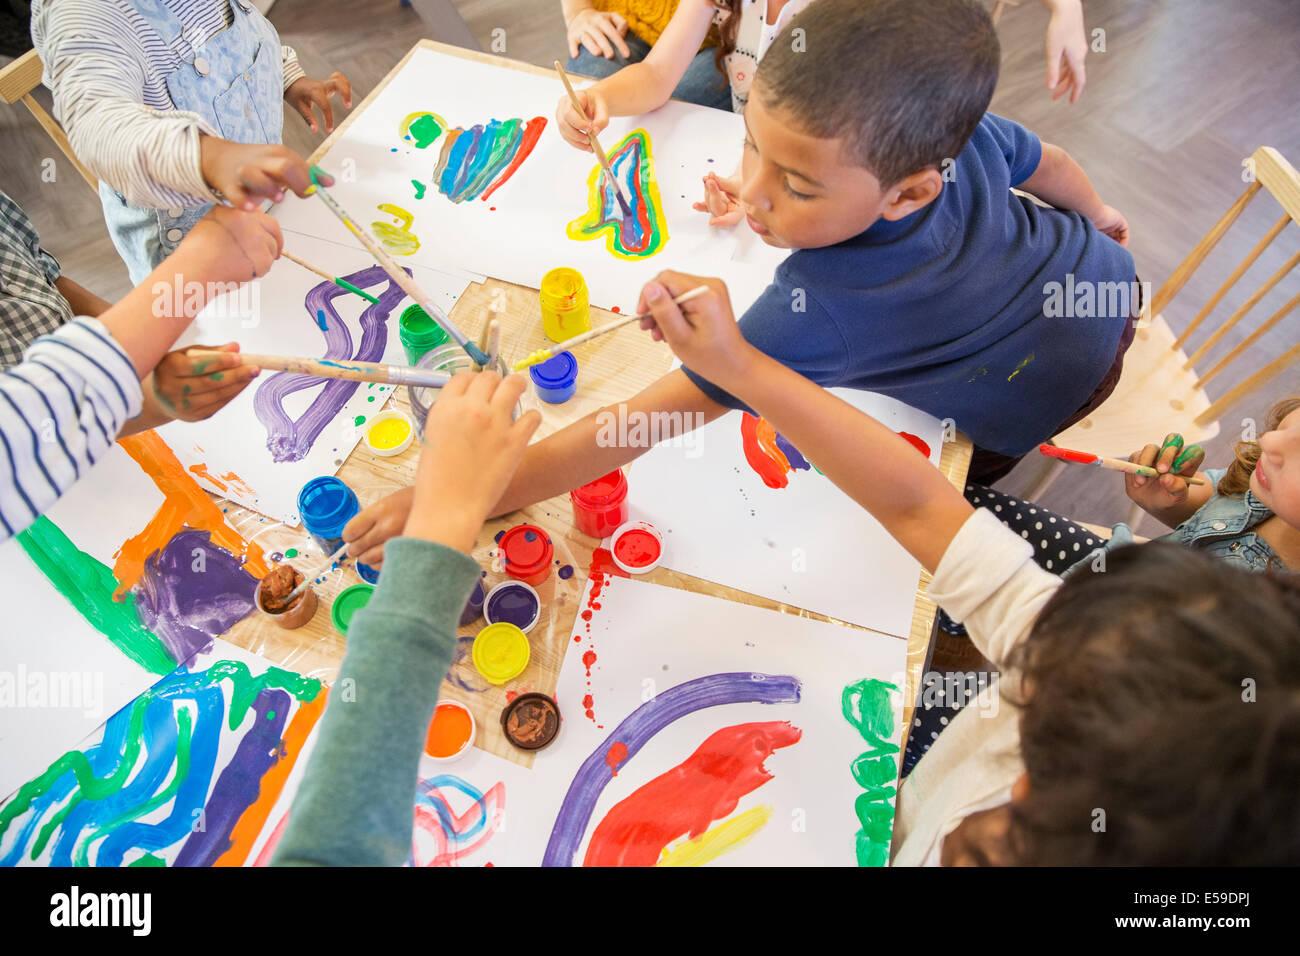 Kinder malen in der Klasse Stockbild